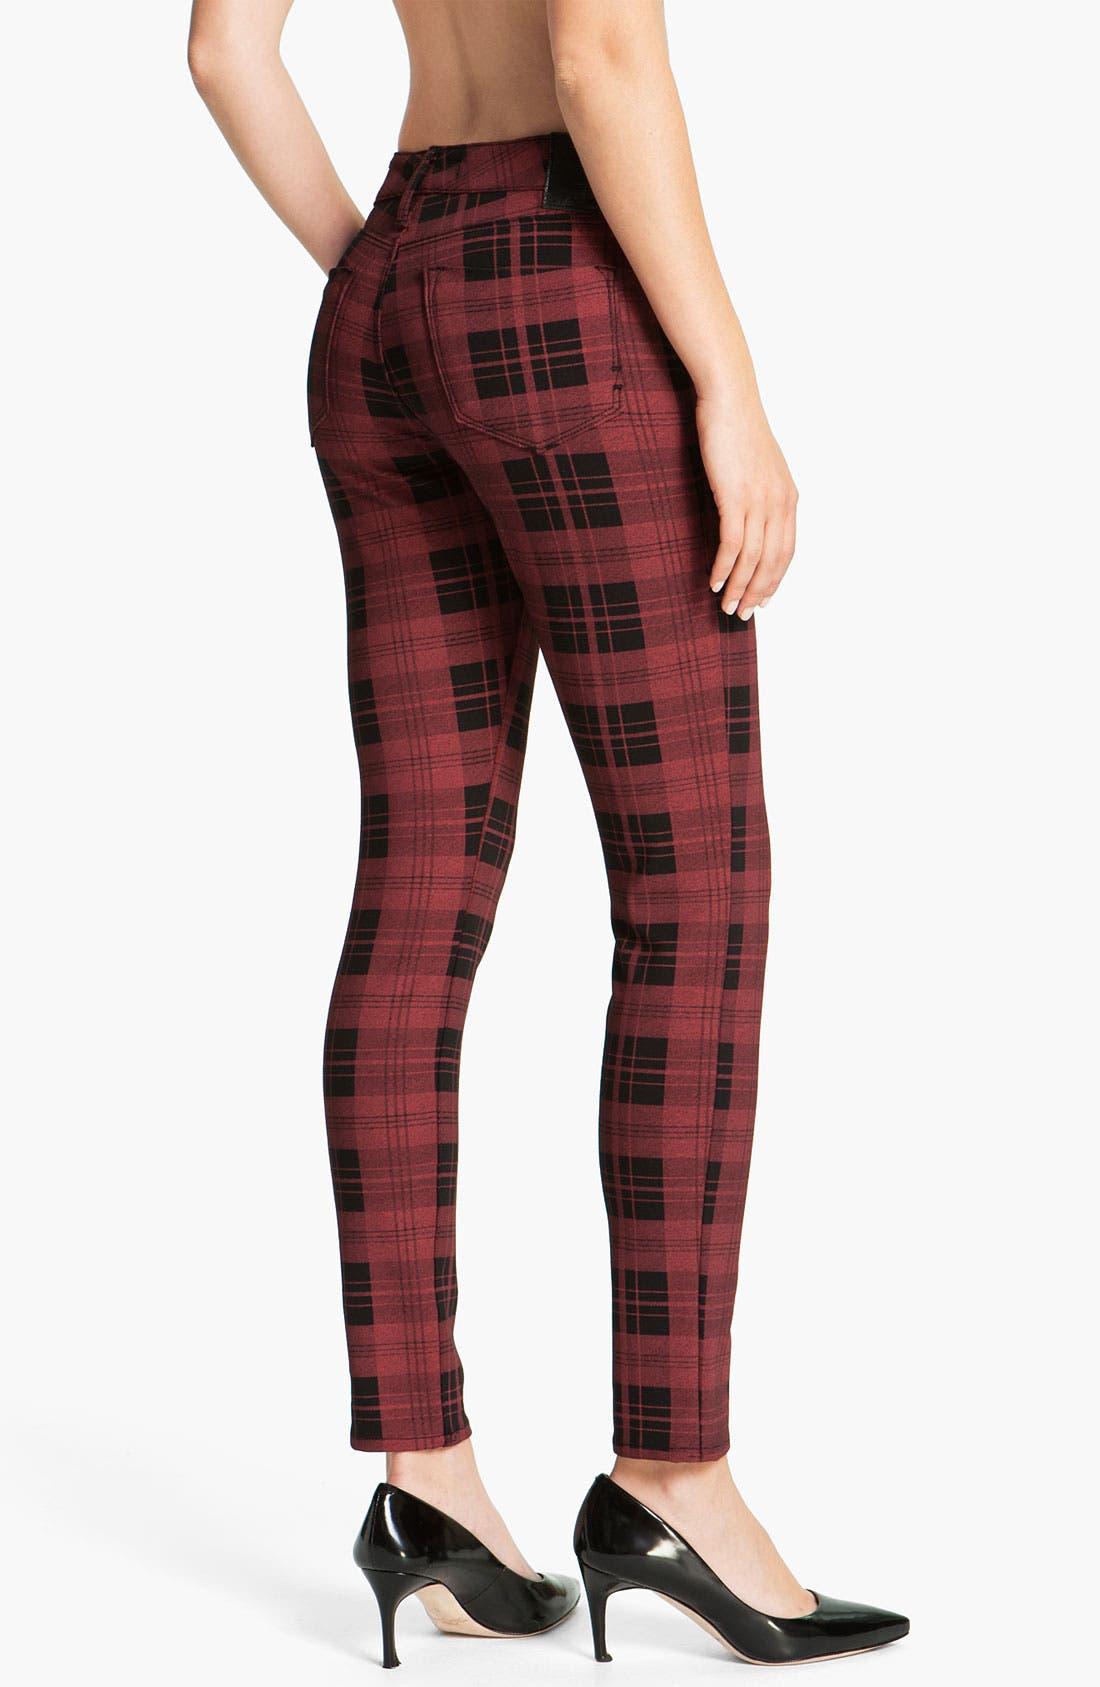 Alternate Image 1 Selected - Dylan George Plaid Skinny Pants (Red/Black Plaid)